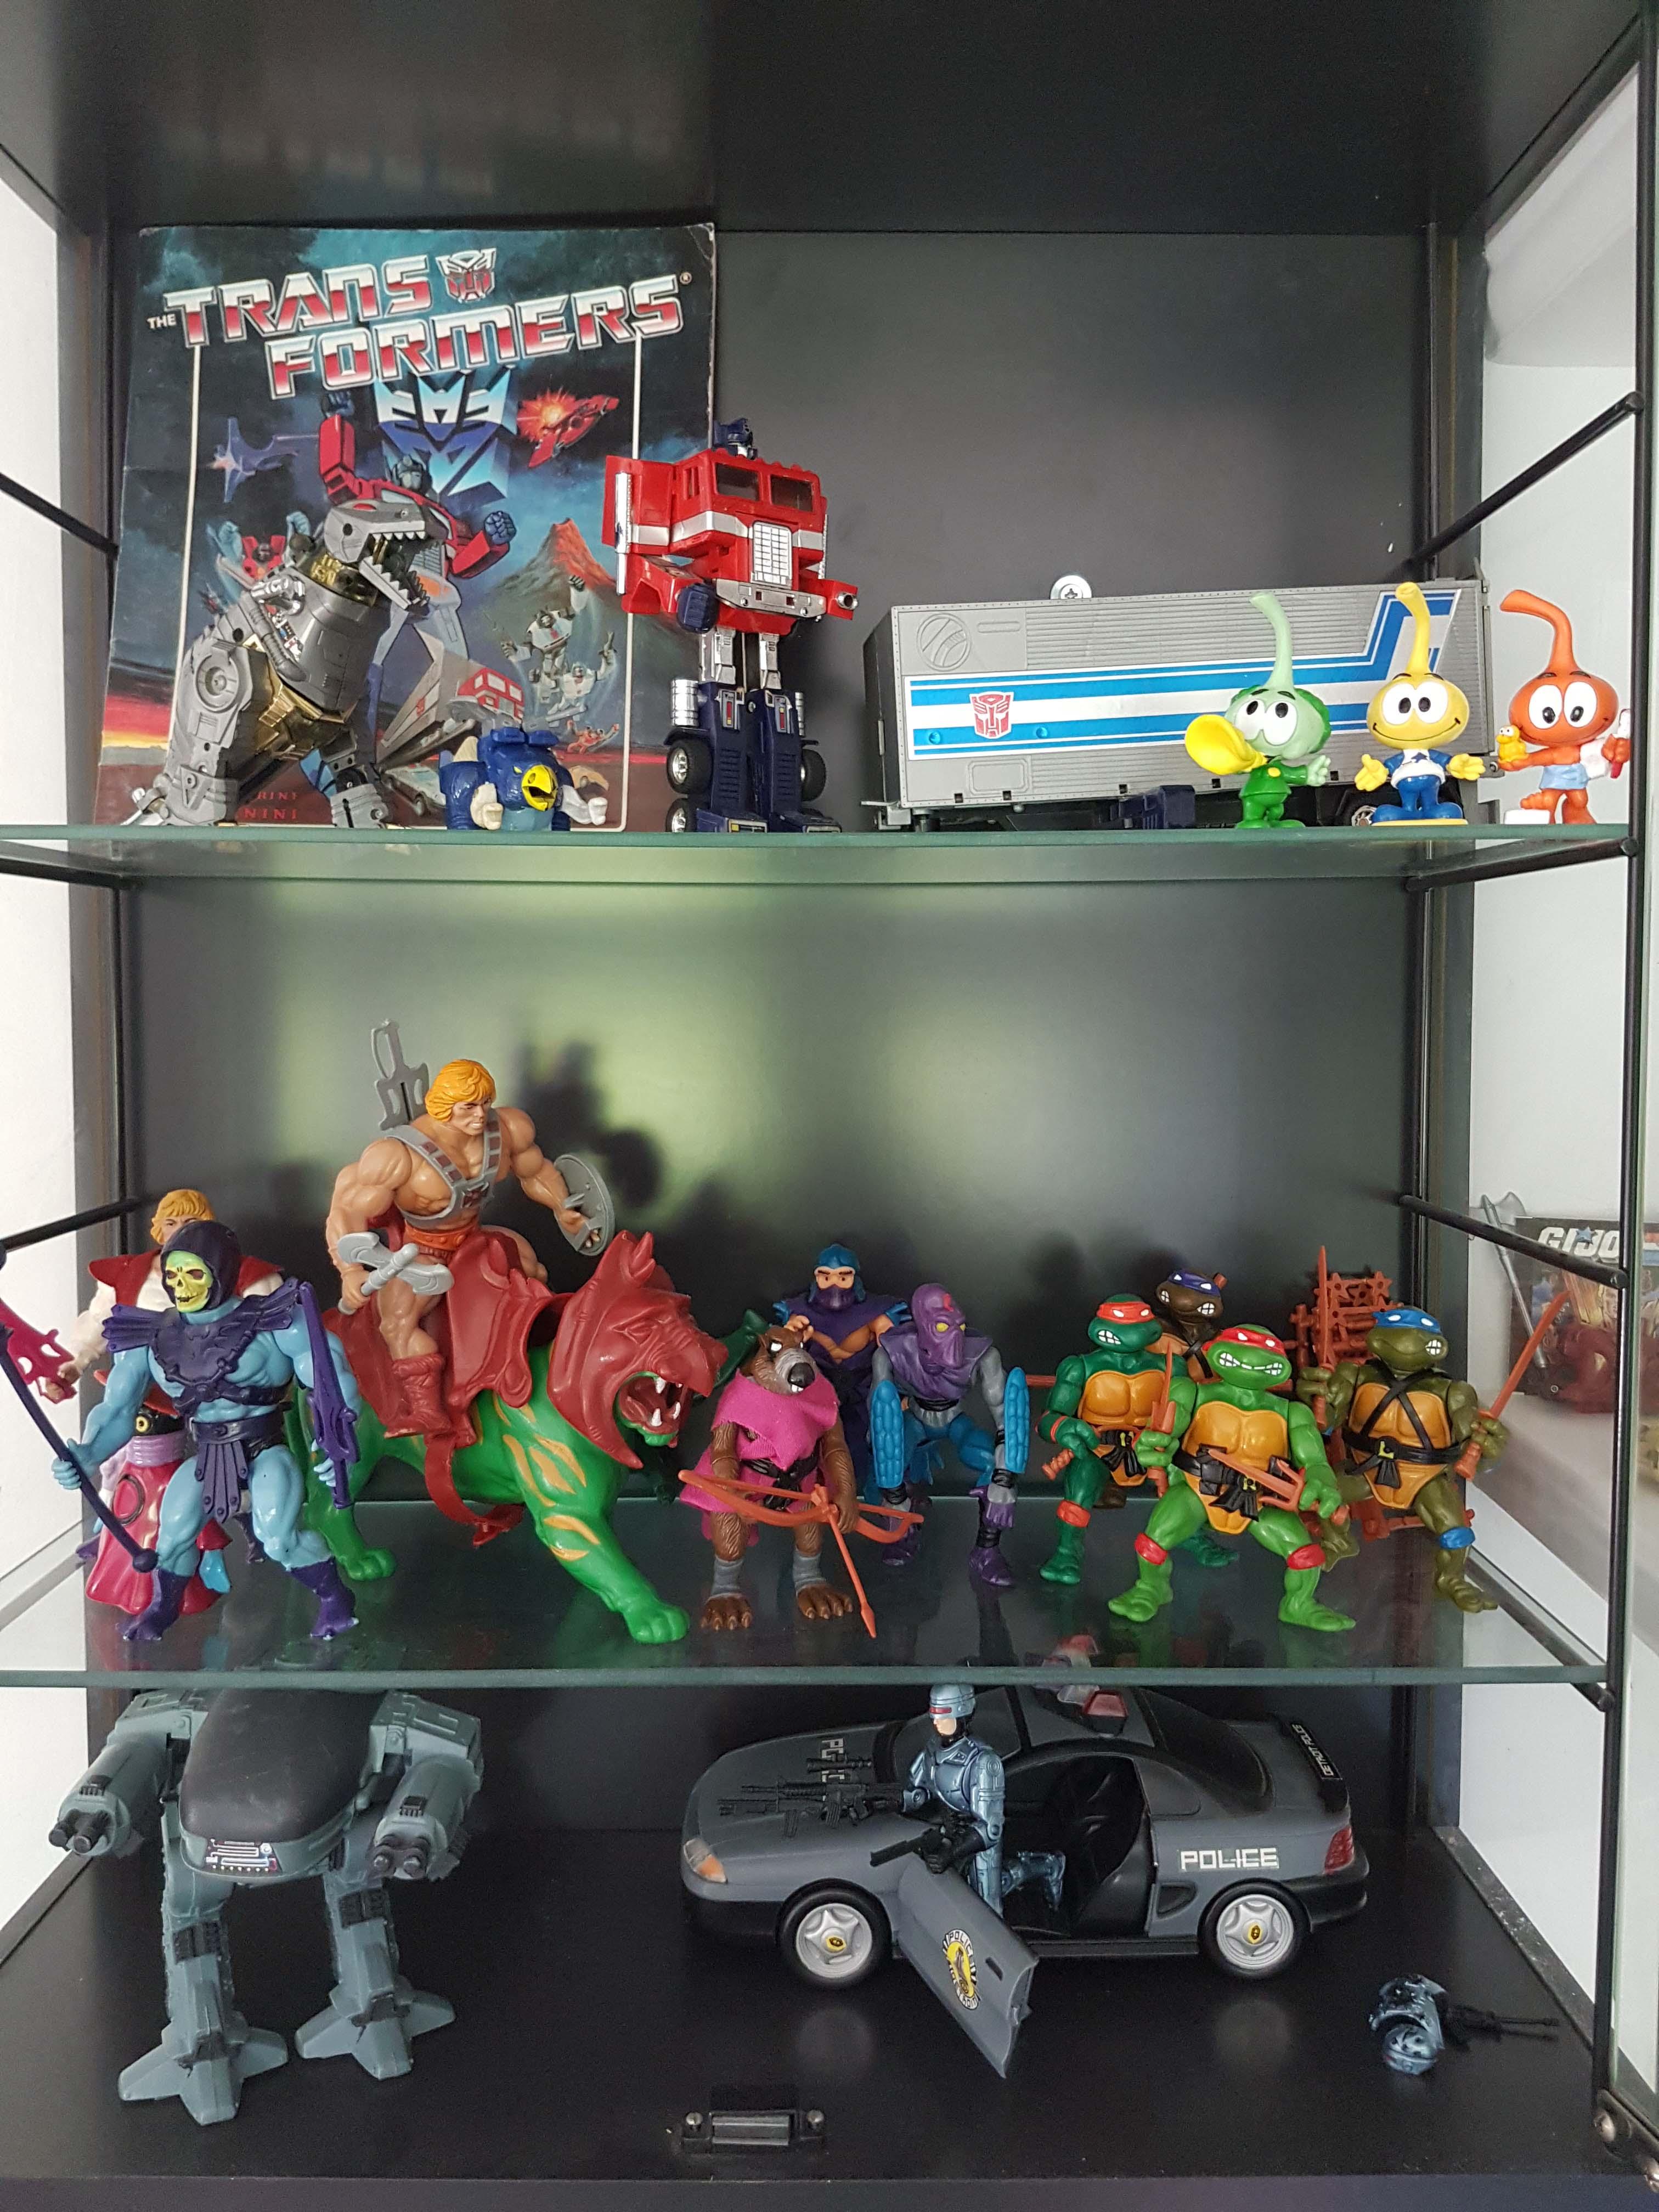 80 Toy Action Figure Shelves - 175376d1497547509-my-humble-vintage-toys-collection-2017-06-15-16_Simple 80 Toy Action Figure Shelves - 175376d1497547509-my-humble-vintage-toys-collection-2017-06-15-16  You Should Have_851335.jpg